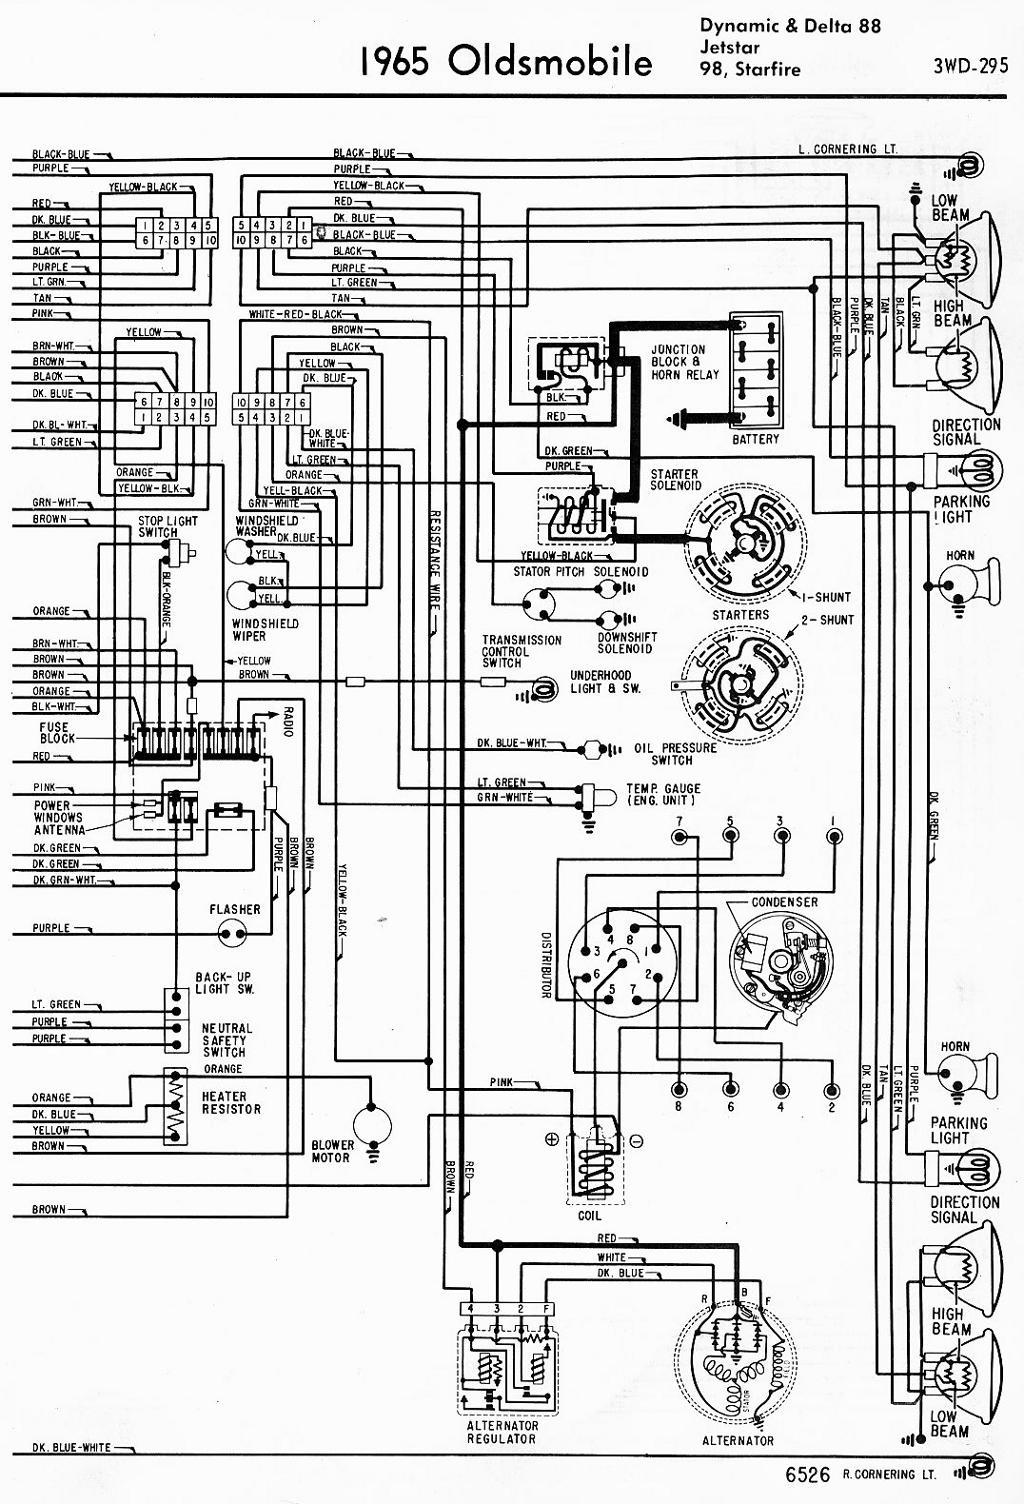 Pretty Car Alarm System Diagram Thin Dimarzio Pickup Wiring Clean Volume Pot Wiring Dimarzio Color Code Old Bulldog Car Alarm Wiring OrangeOne Humbucker One Volume Clifford Car Alarm Wire Diagram   Lefuro